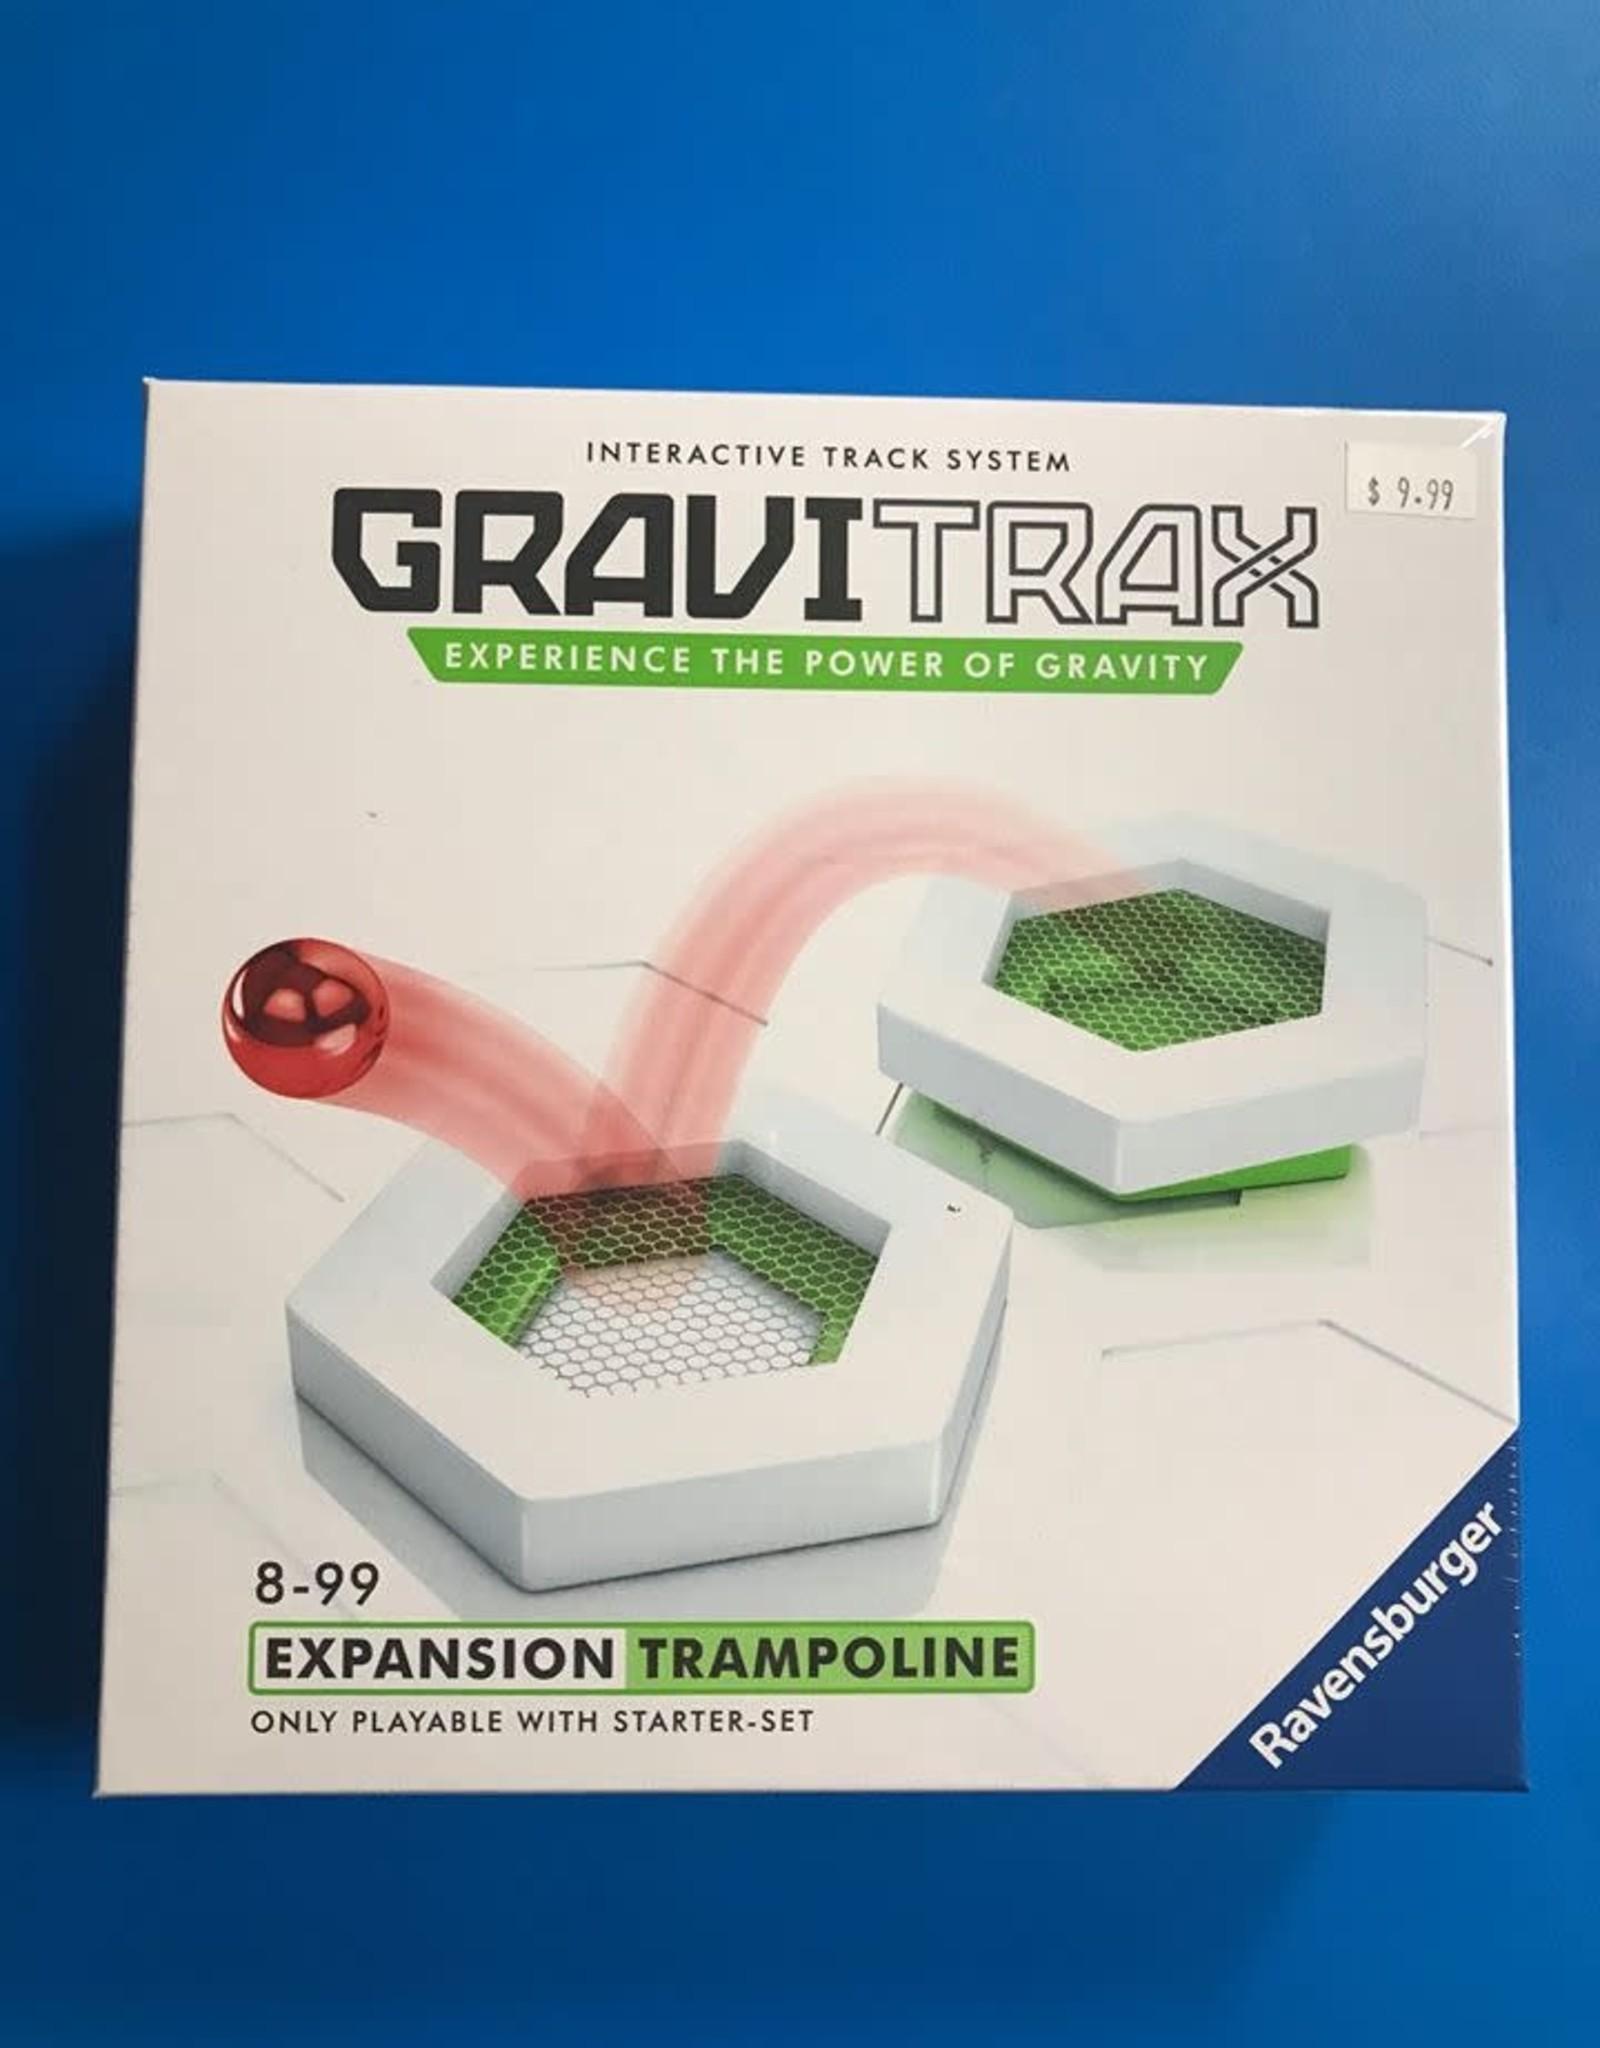 TRAMPOLINE EXPANSION